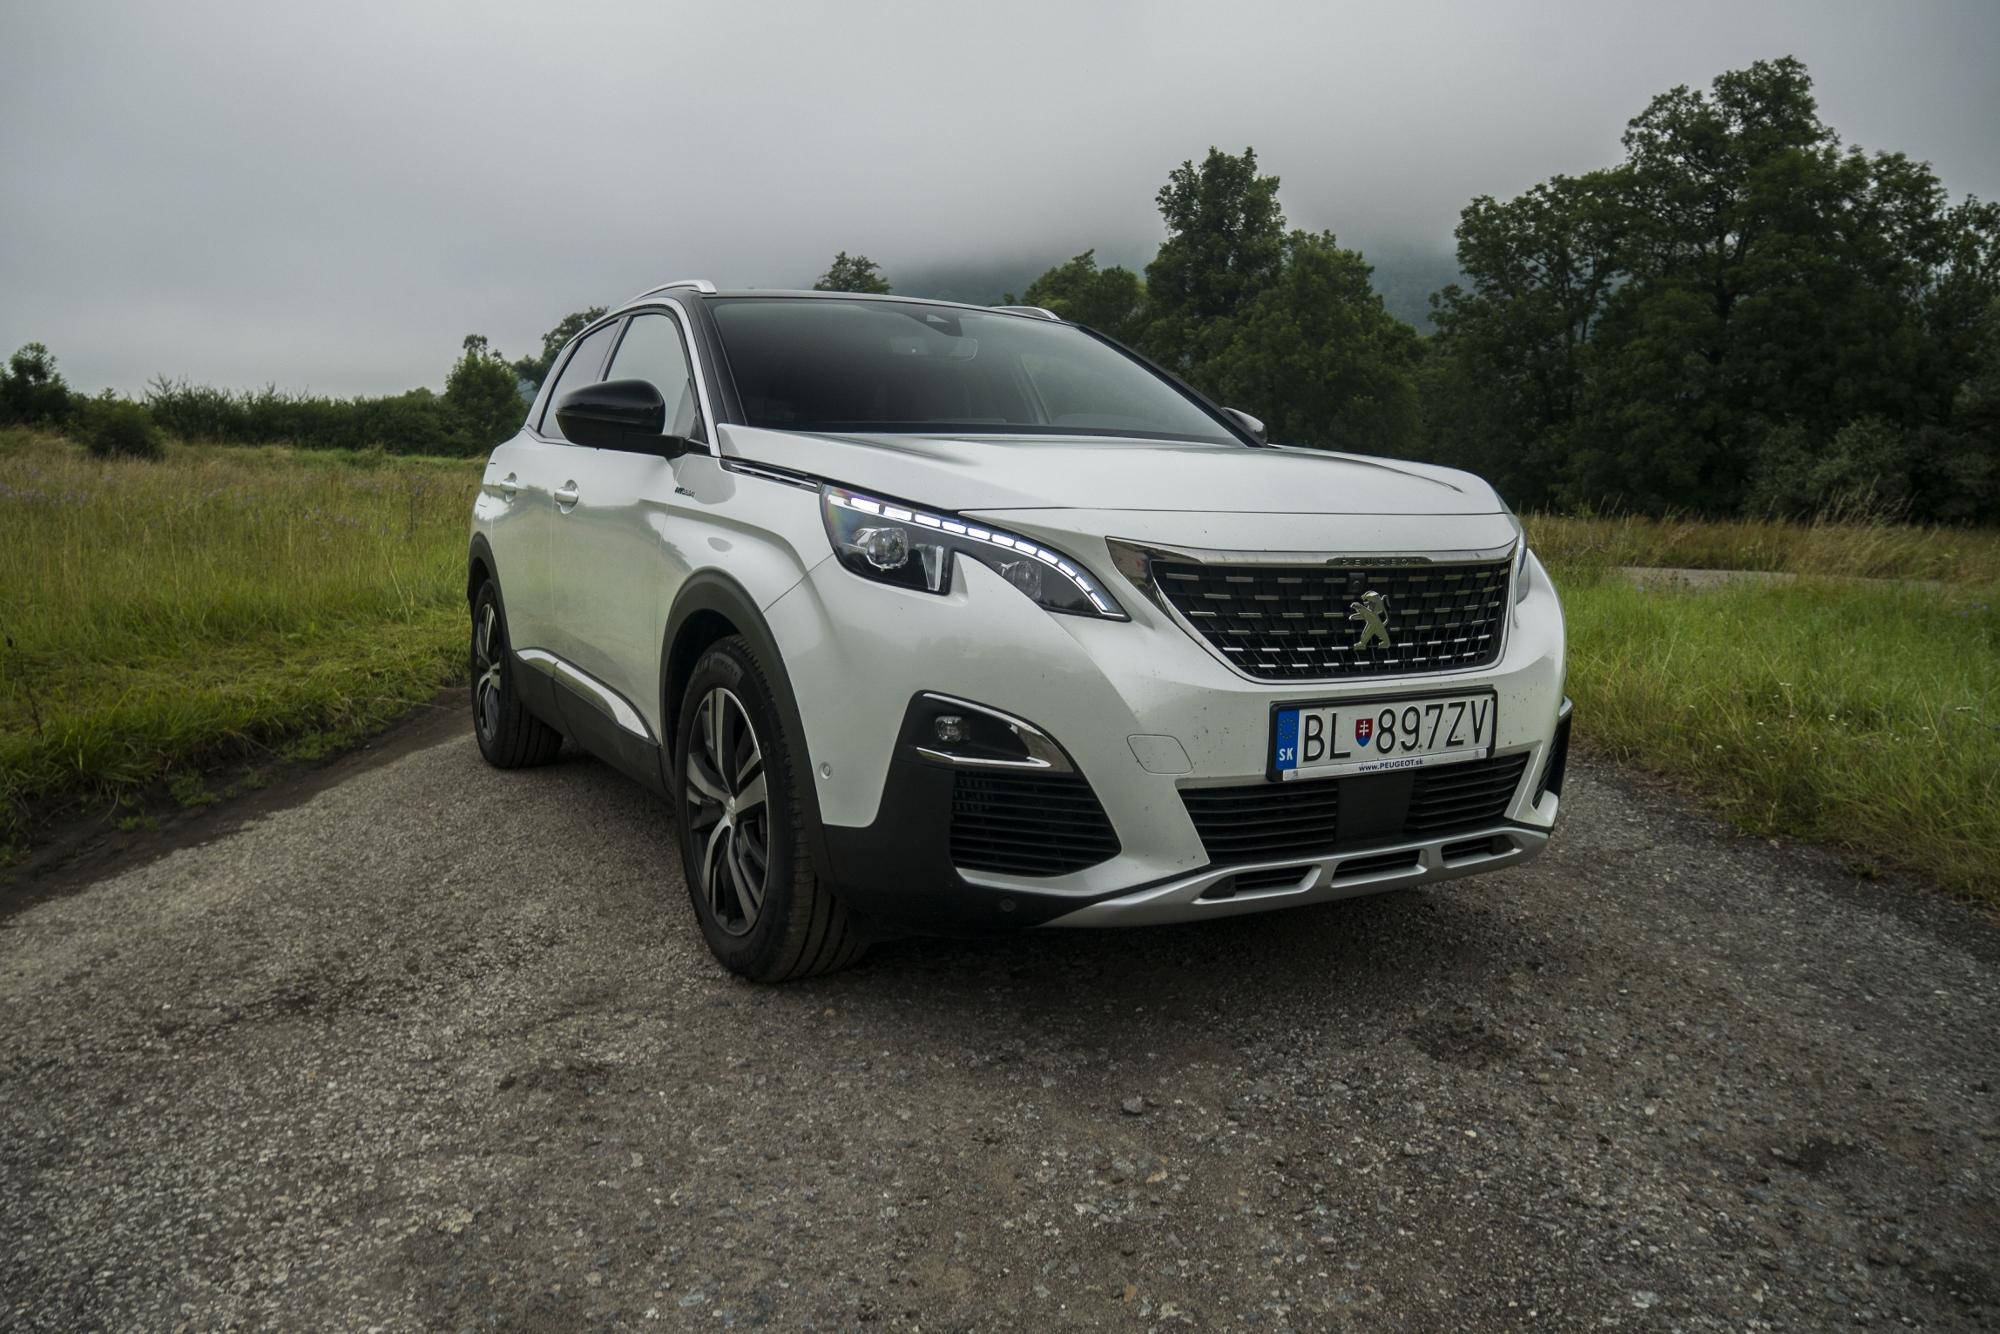 Test: Peugeot 3008 posúva schopnosti plug in hybridov SMCx6vMBMs peugeot-3008-hybrid4-1